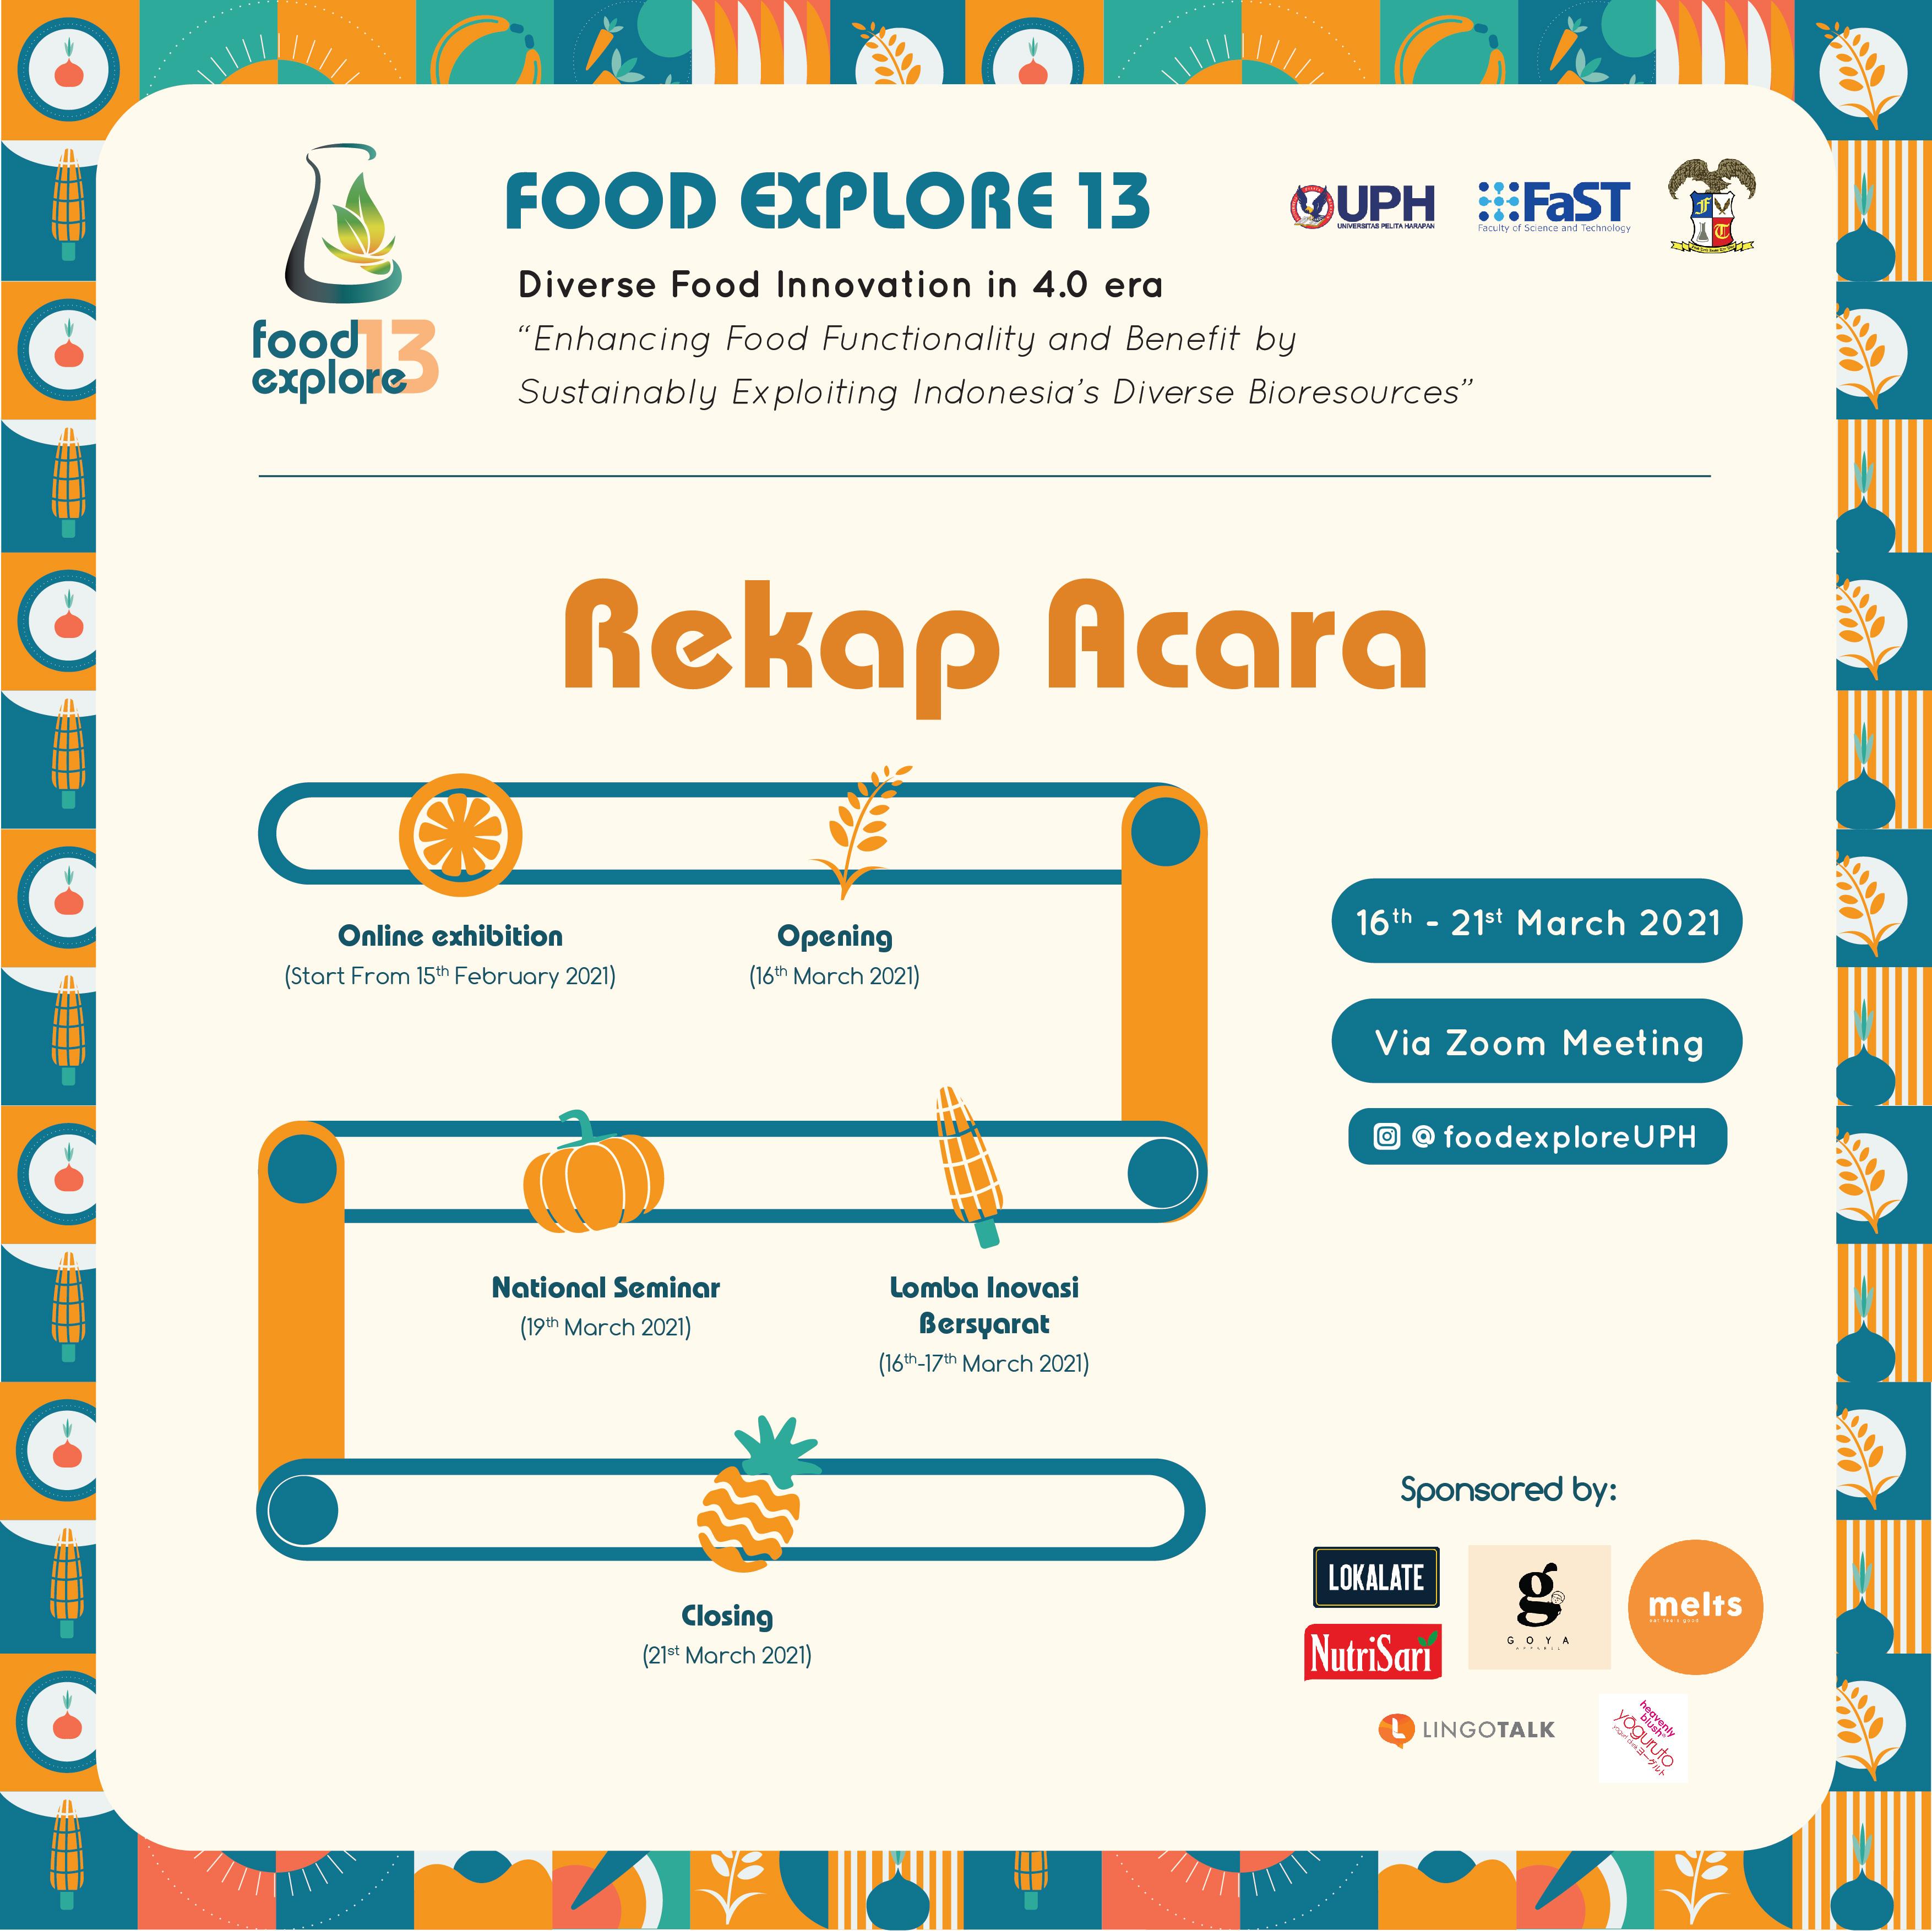 Food Explore 13